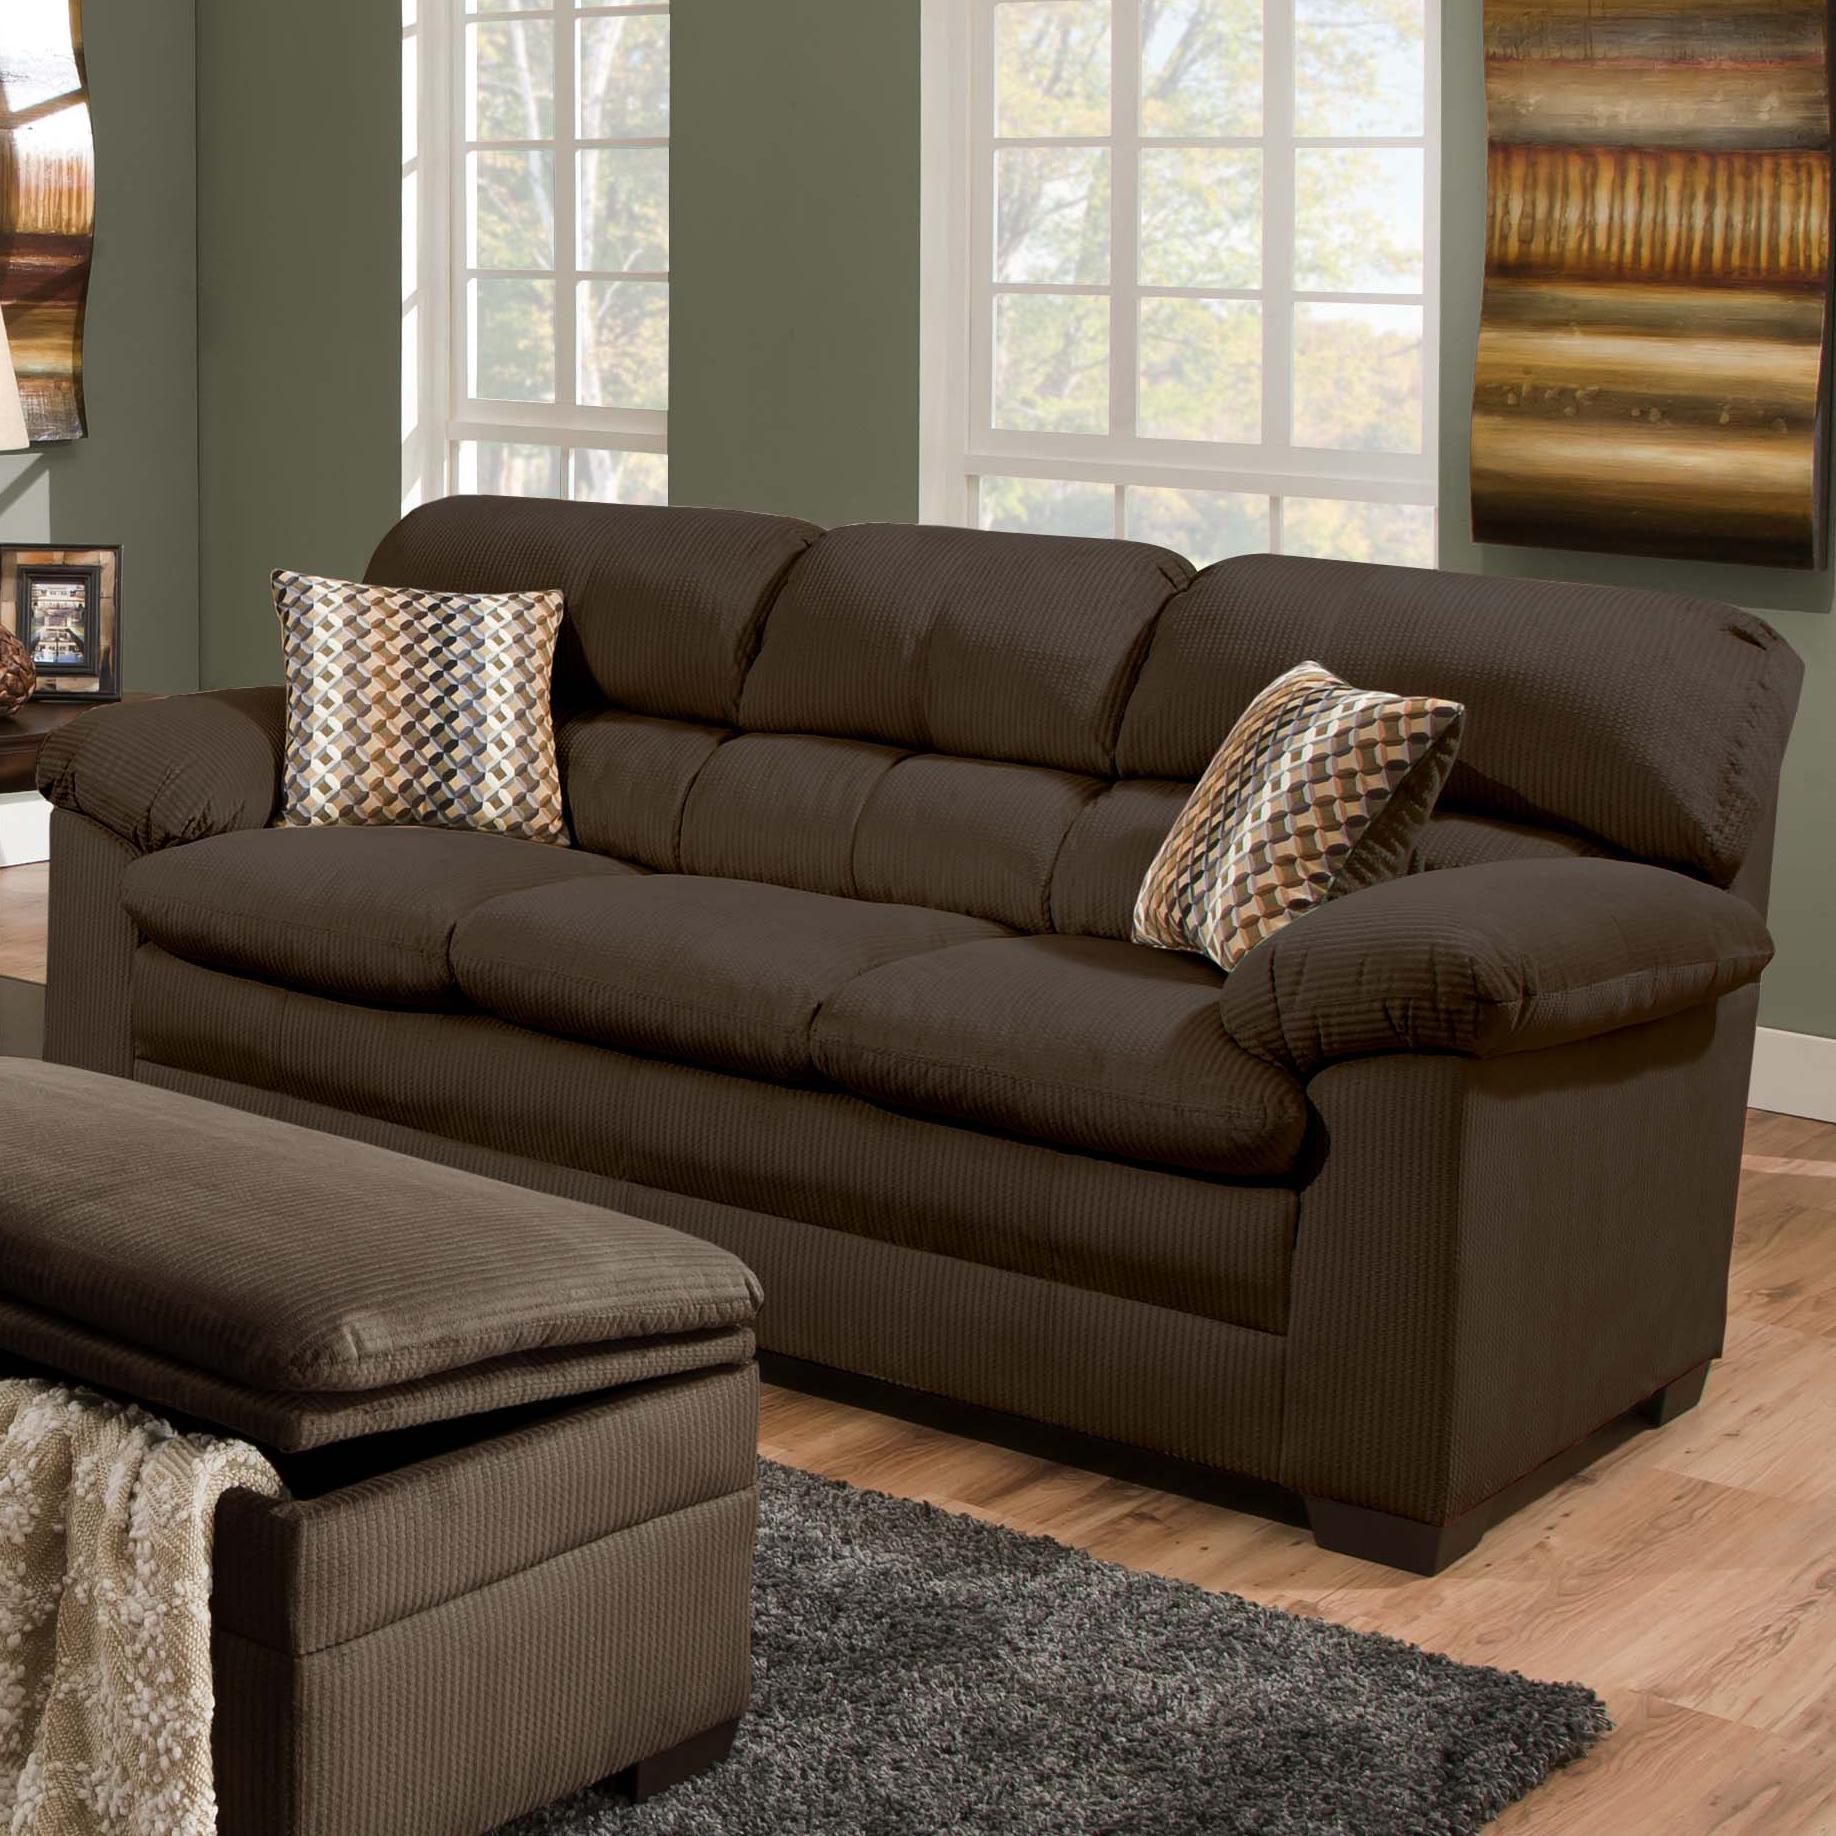 sofa cappuccino neu modelle sofa moderne deko ideen cappuccino wand rot sofa ideen moderne with. Black Bedroom Furniture Sets. Home Design Ideas